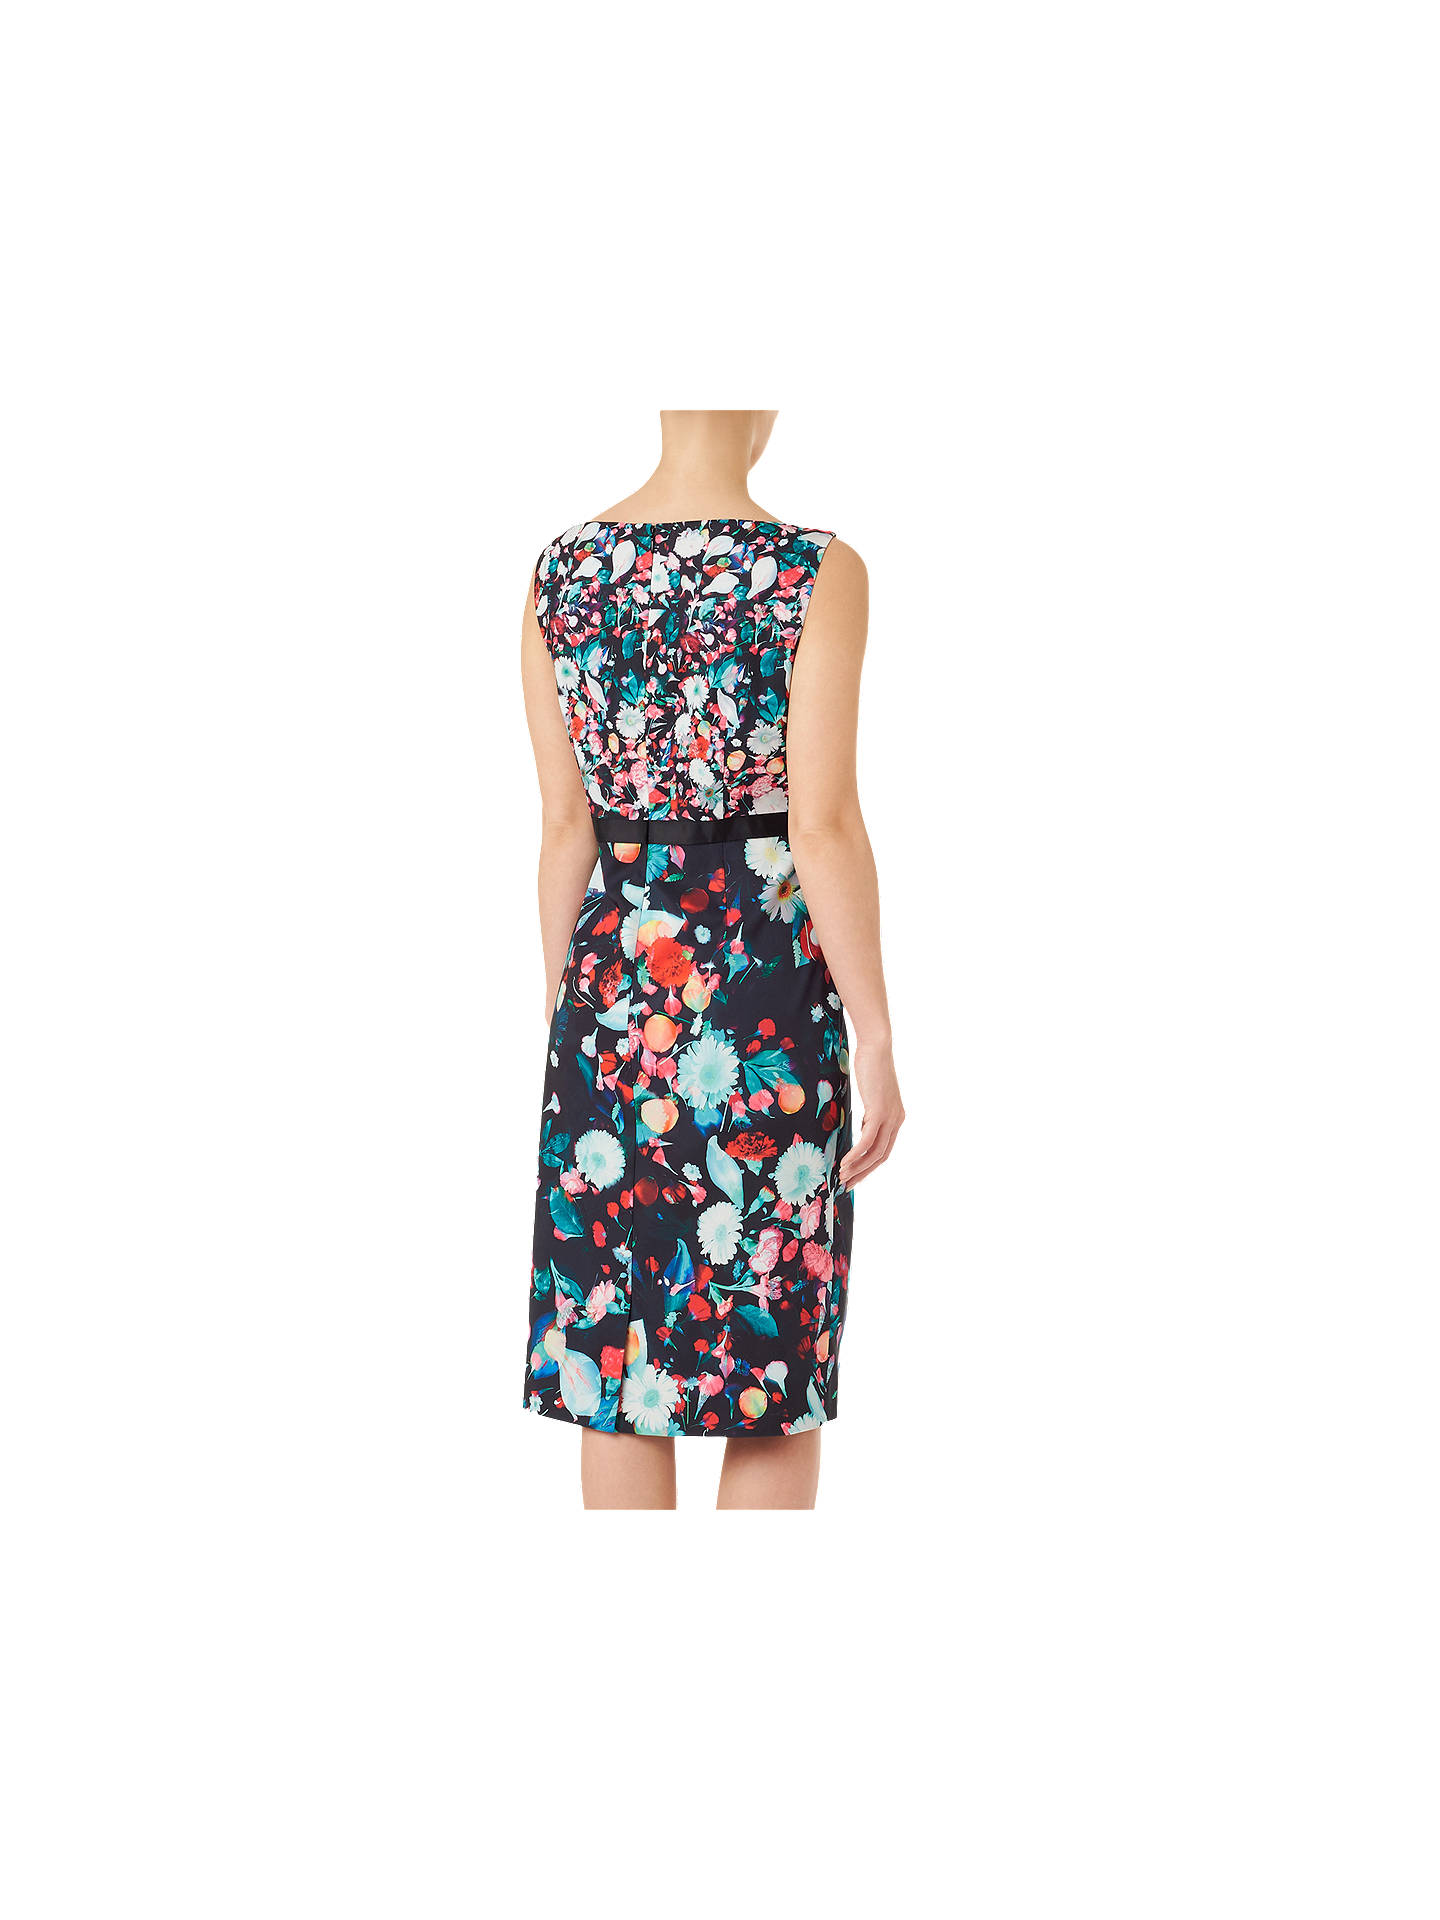 girl-models-cotton-sateen-black-dress-gets